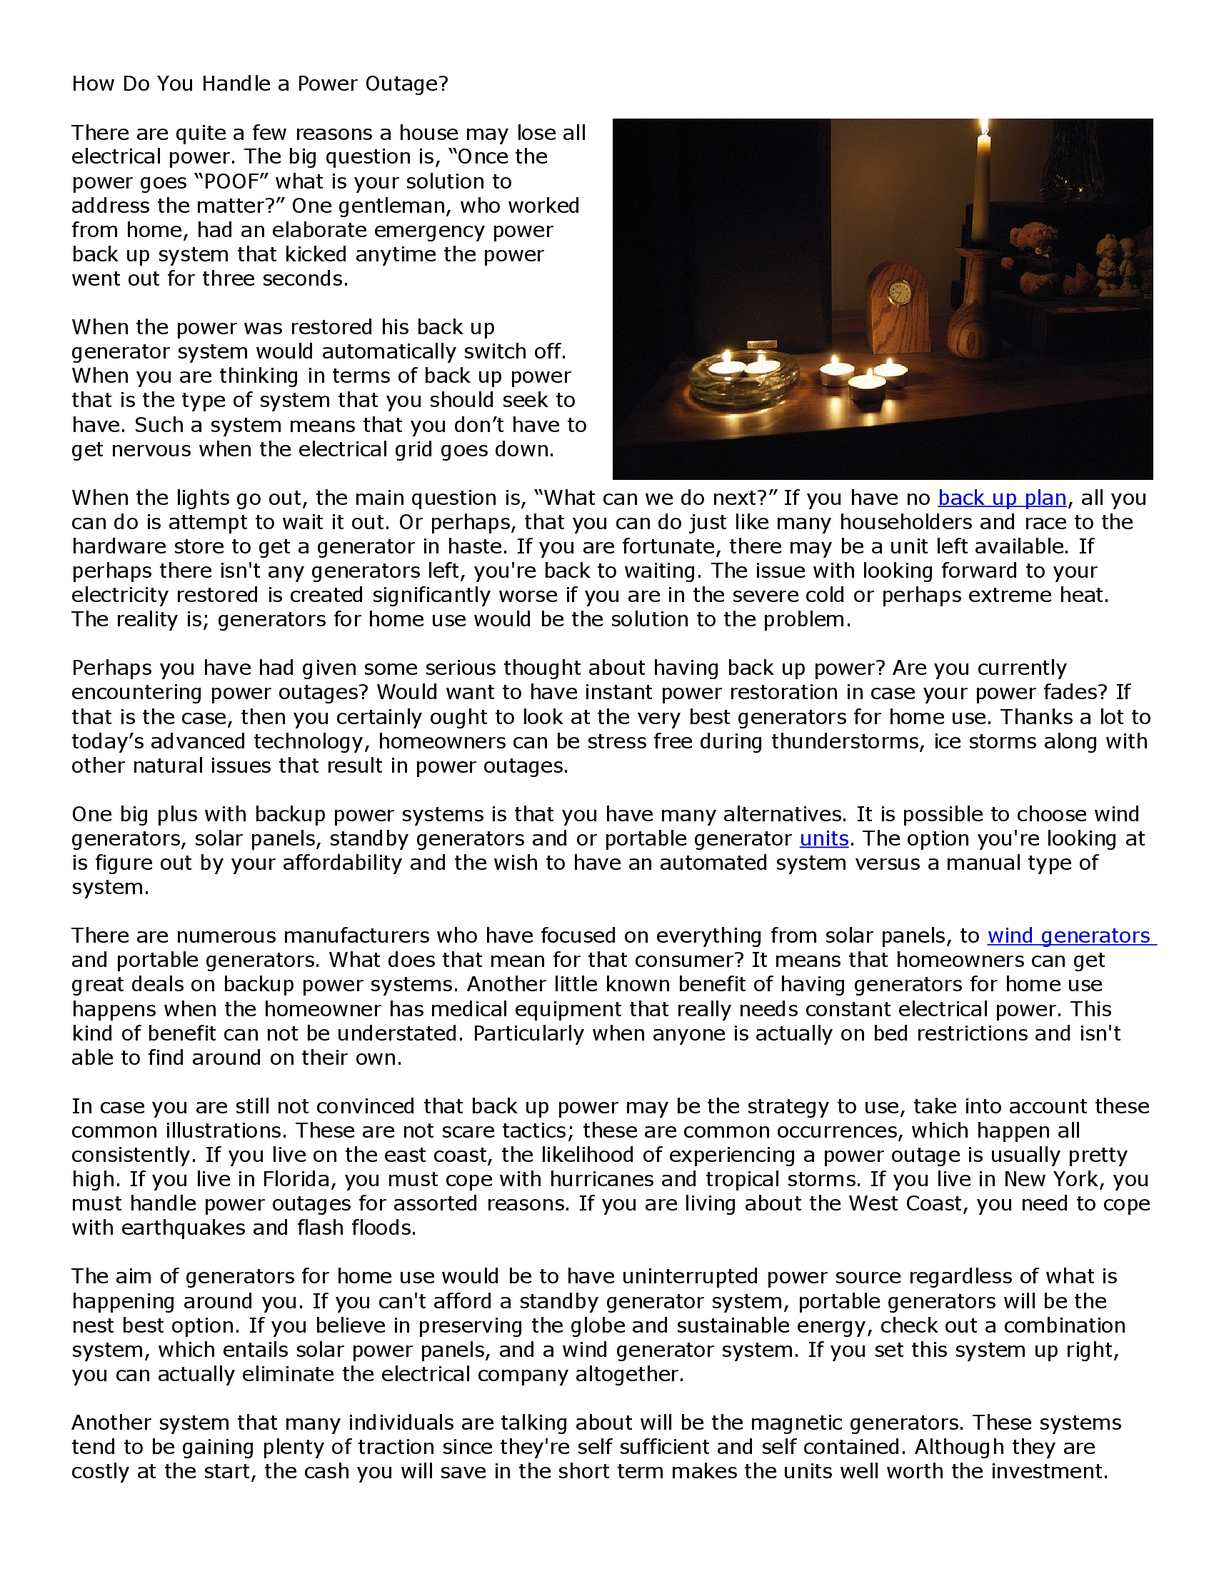 Calaméo - How Do You Handle a Power Outage